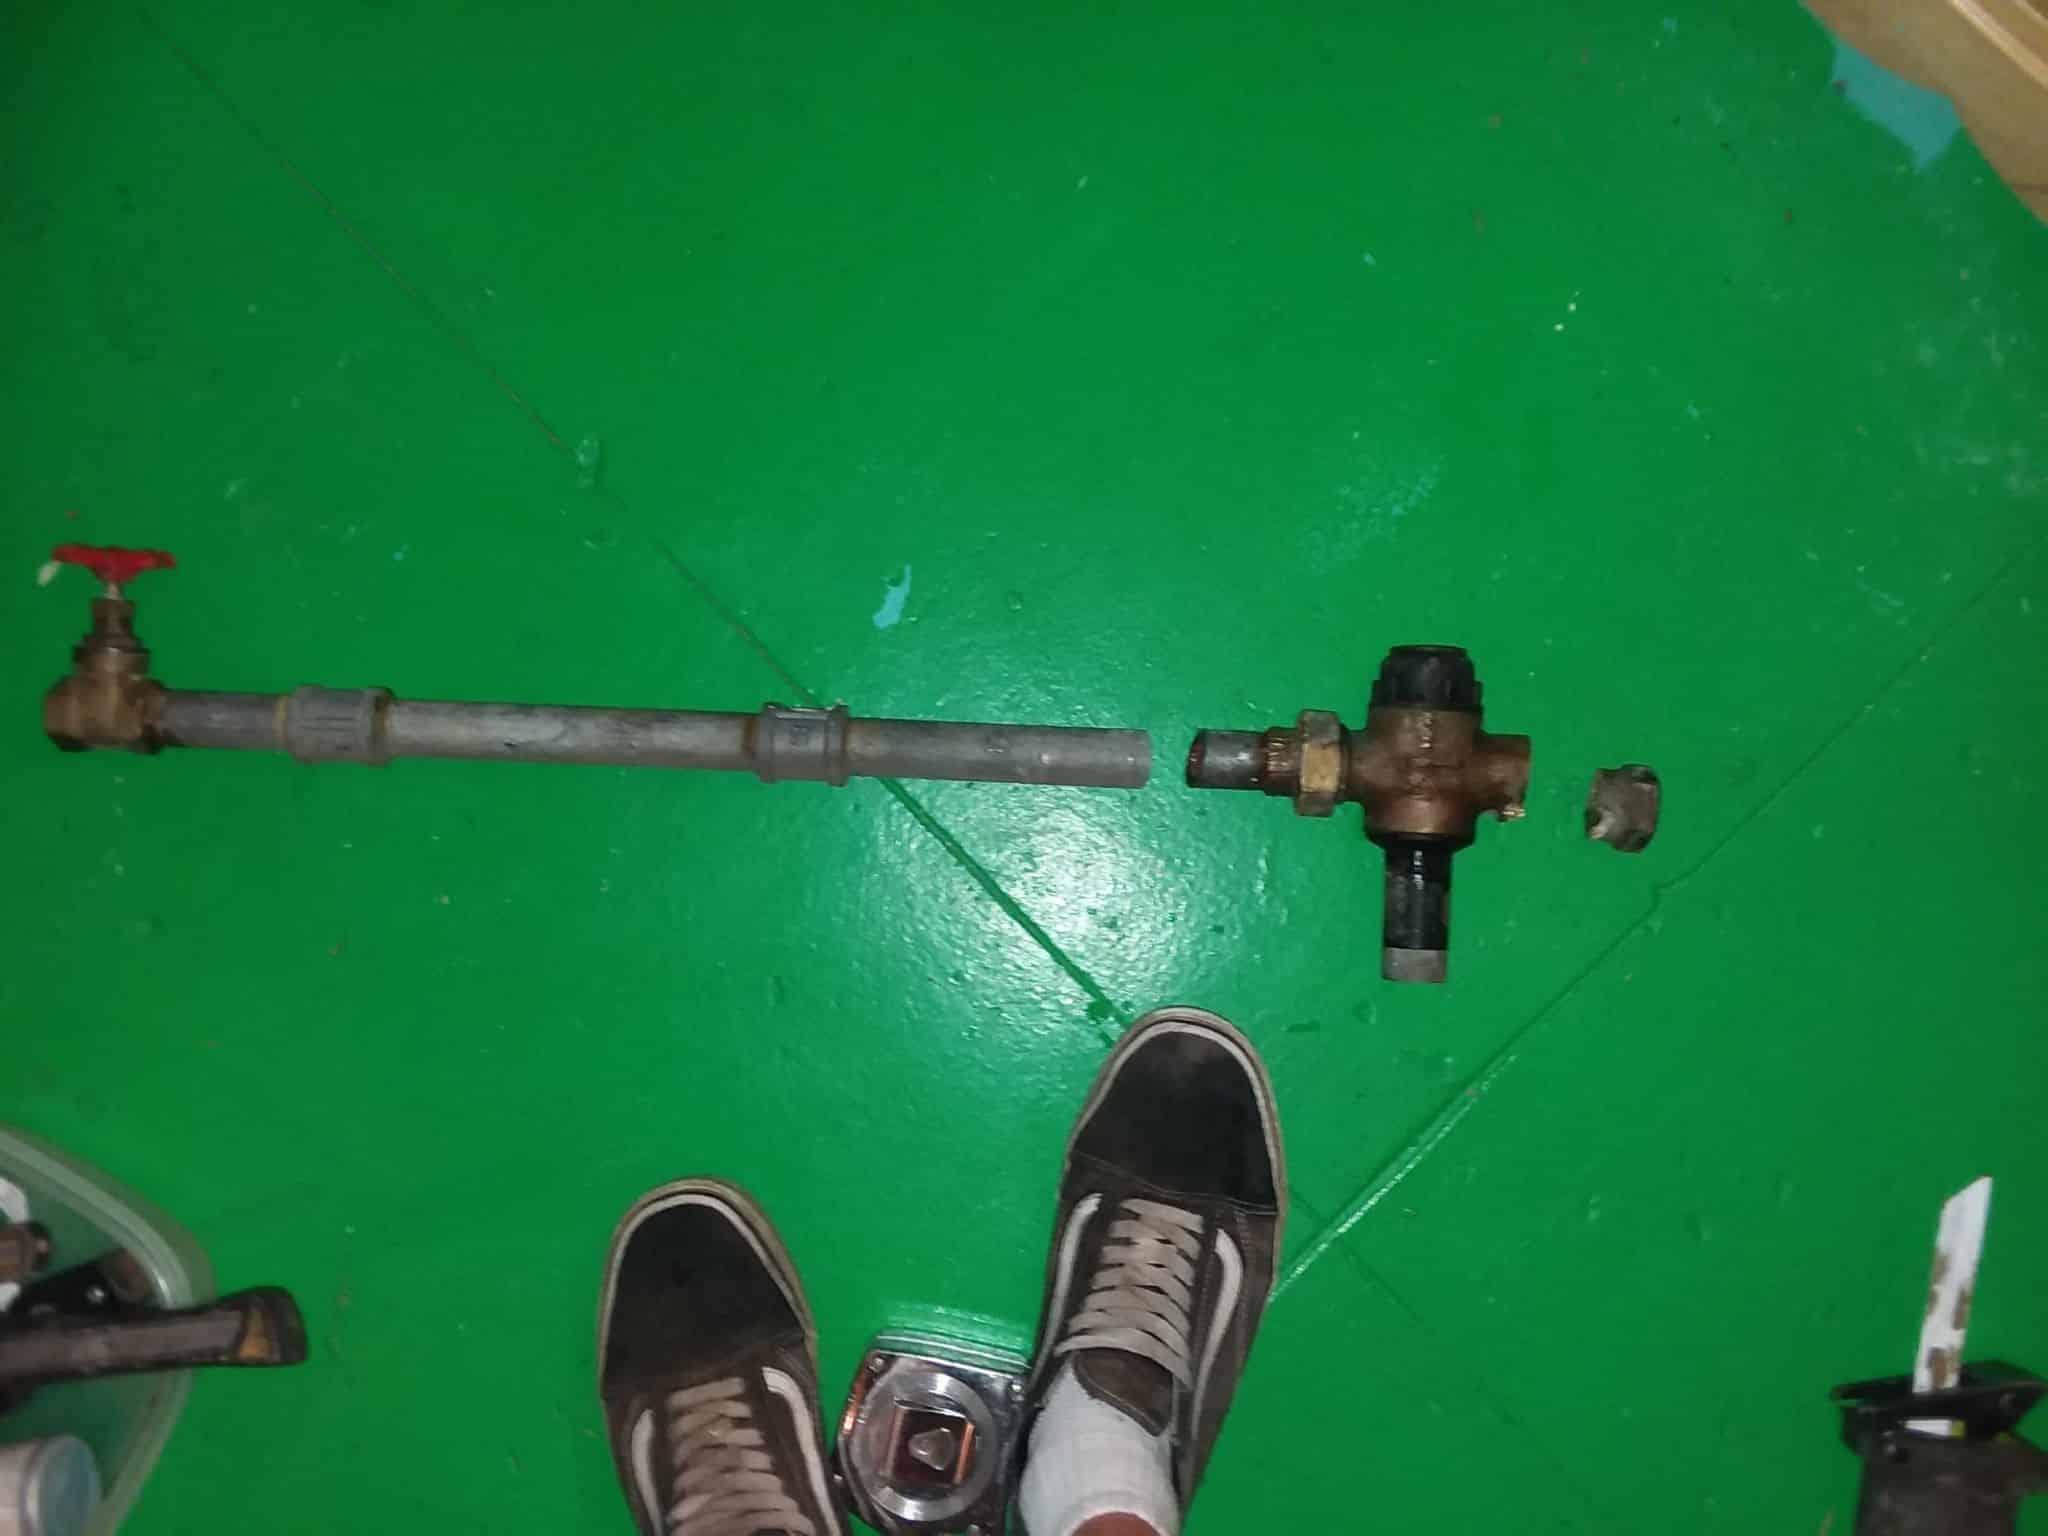 Disabled valve